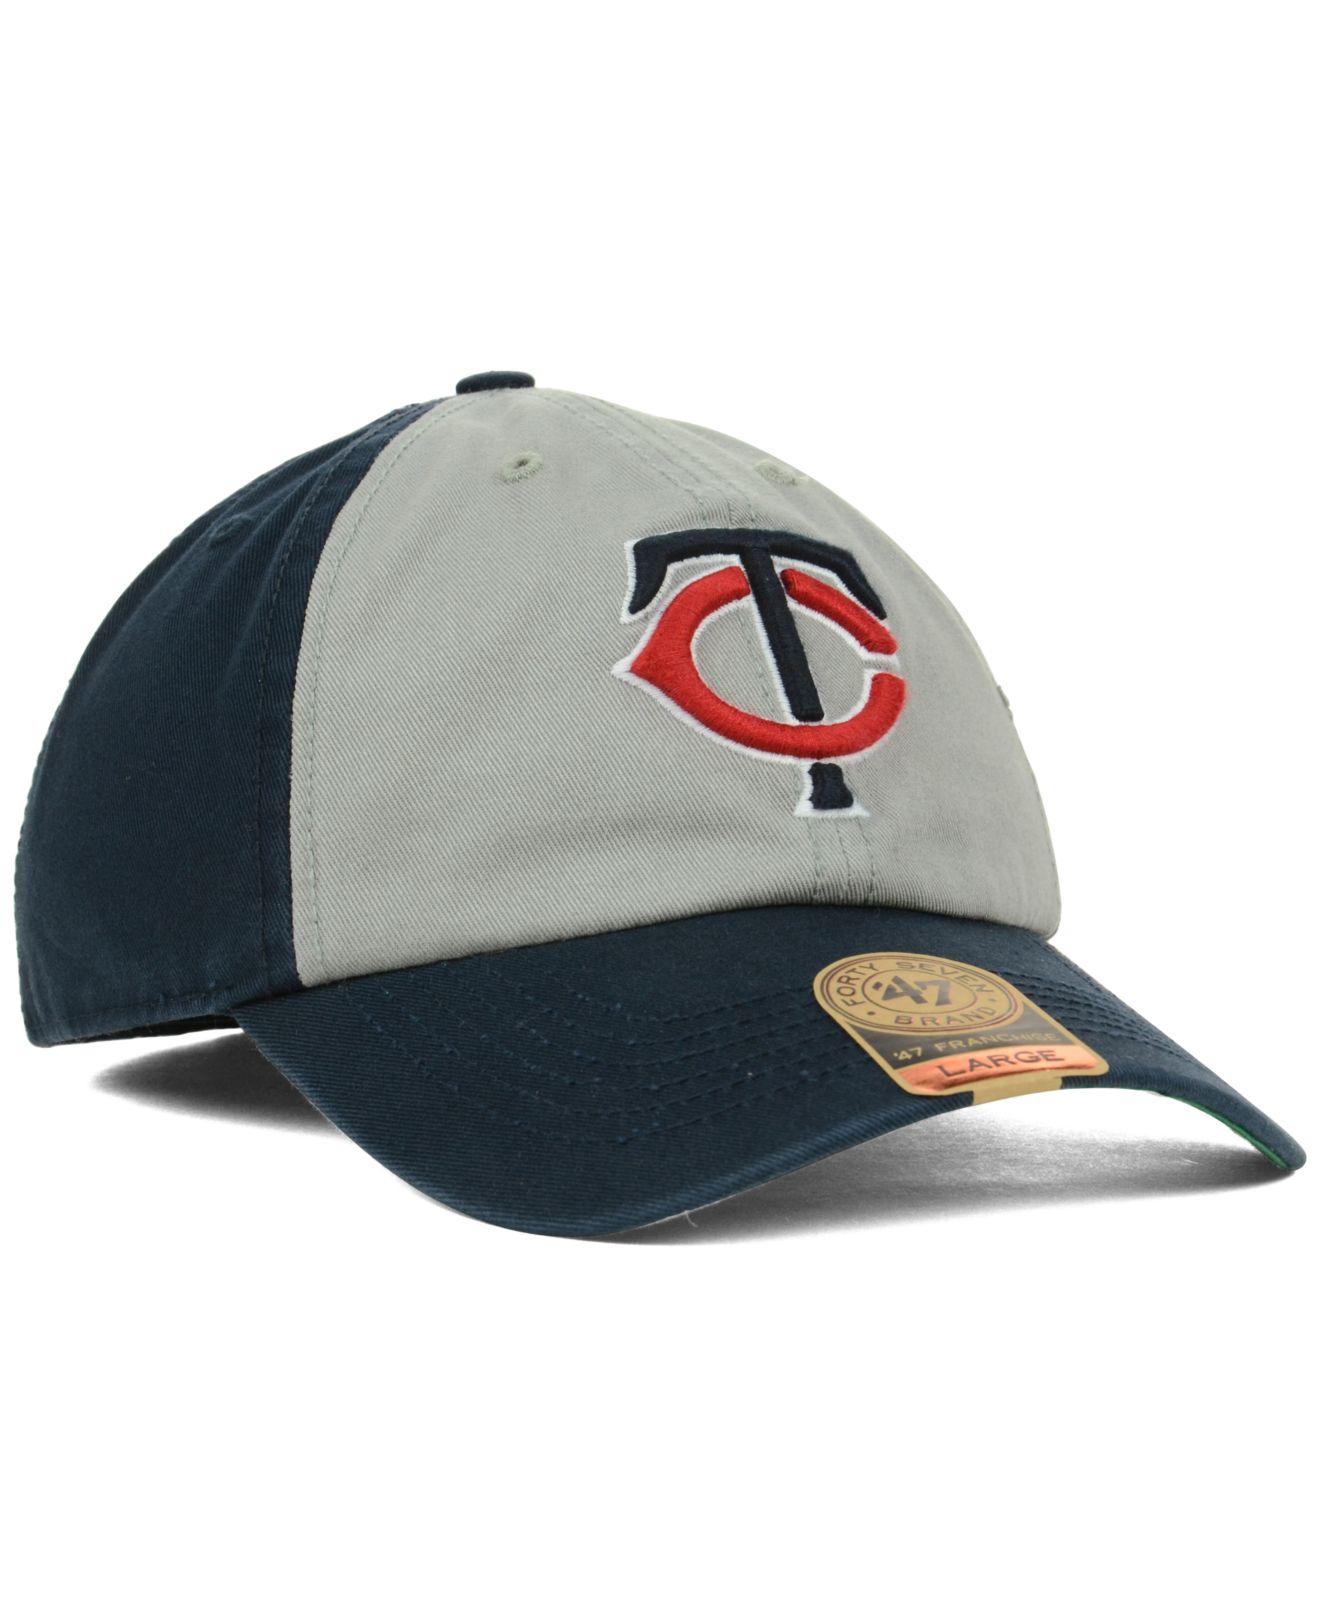 lyst 47 brand minnesota twins vip franchise cap in gray for men